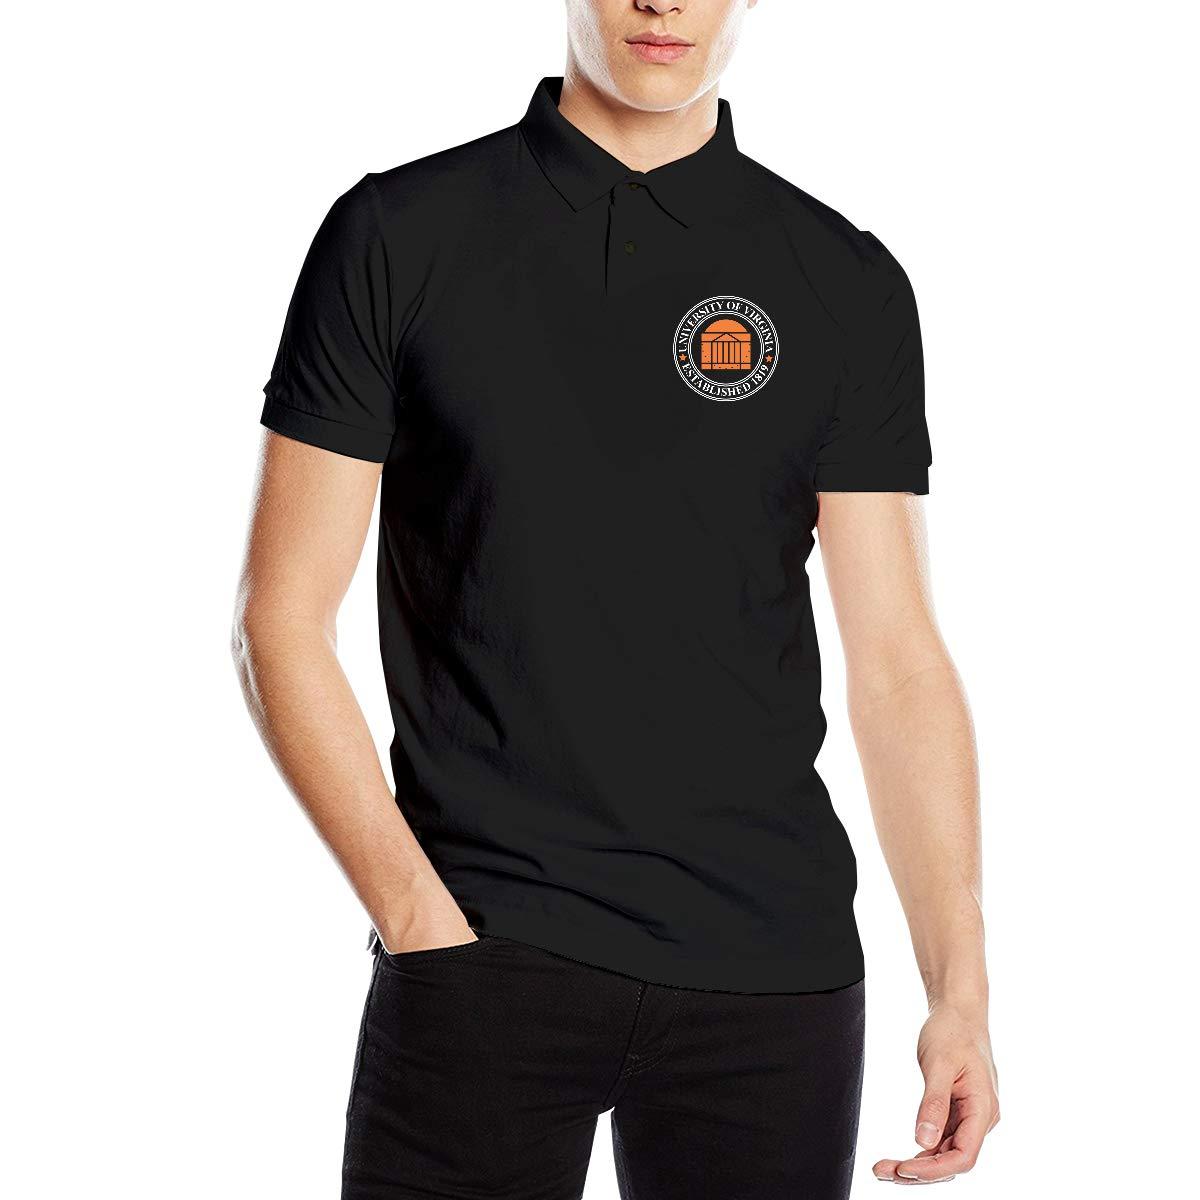 QTHOO Mens University of Virginia Established 1819 Short Sleeve Polo T Shirt